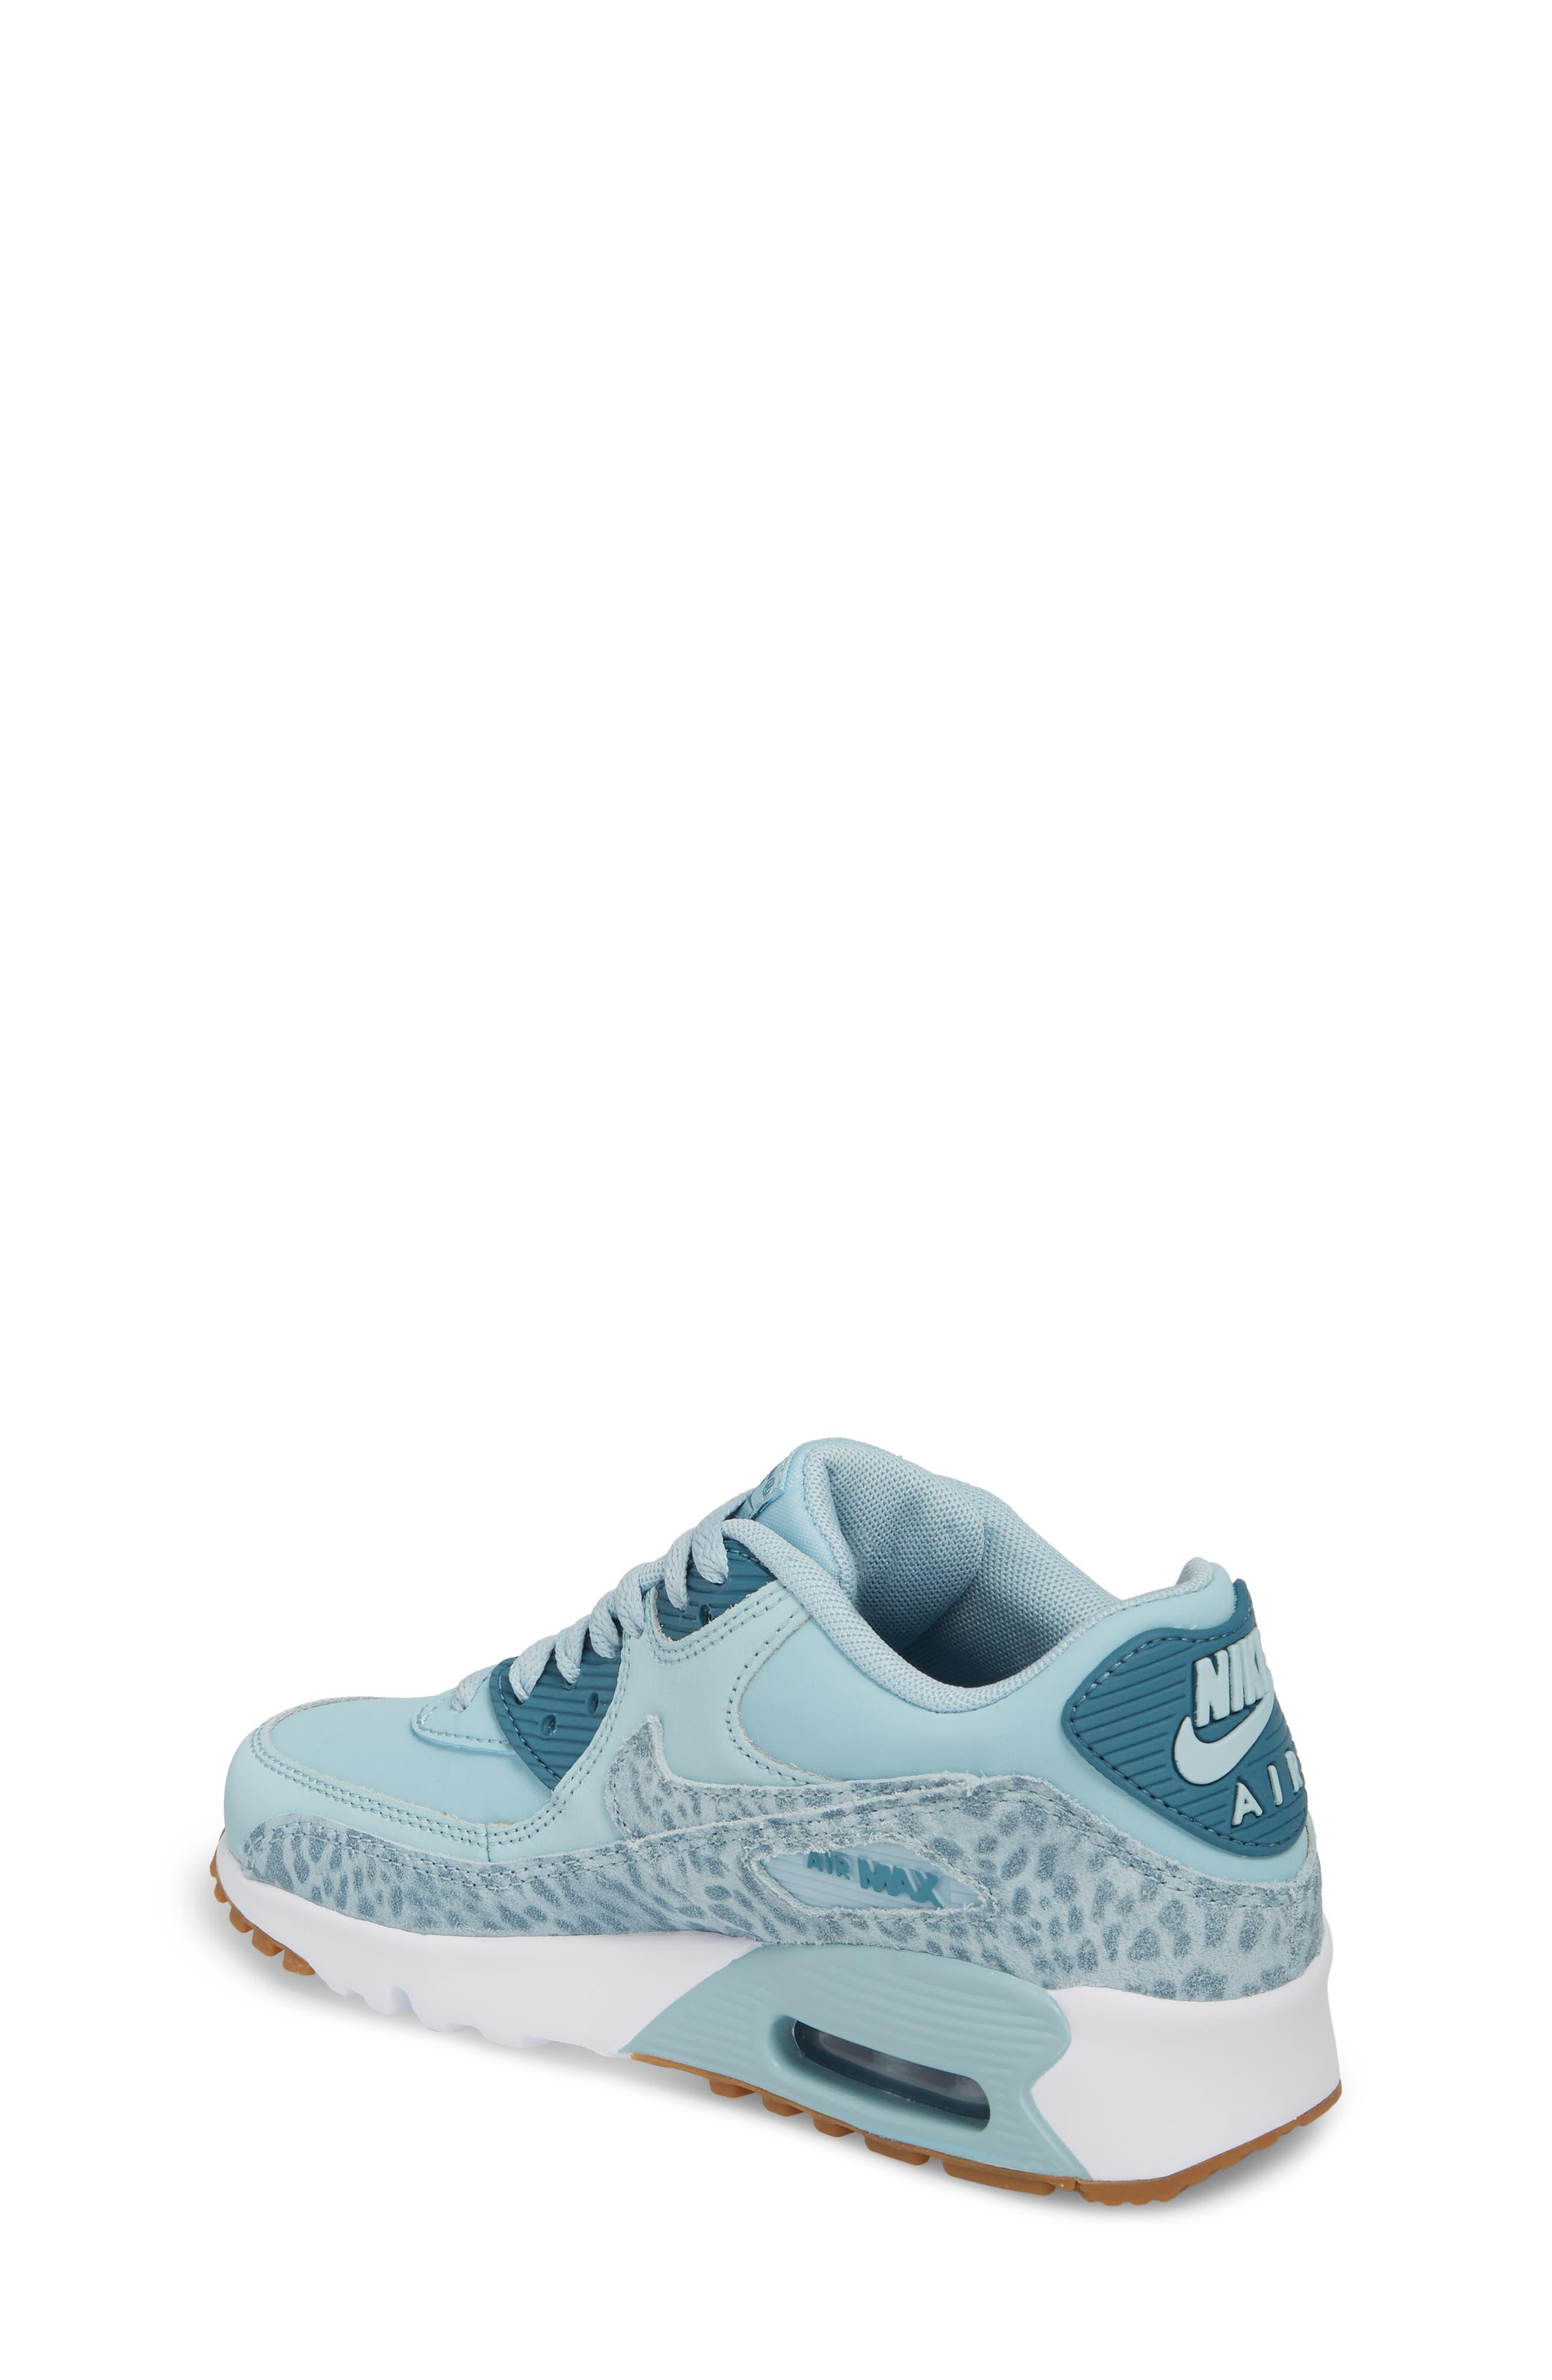 Air Max 90 Leather Sneaker,                             Alternate thumbnail 2, color,                             Ocean Bliss/ Noise Aqua/ White